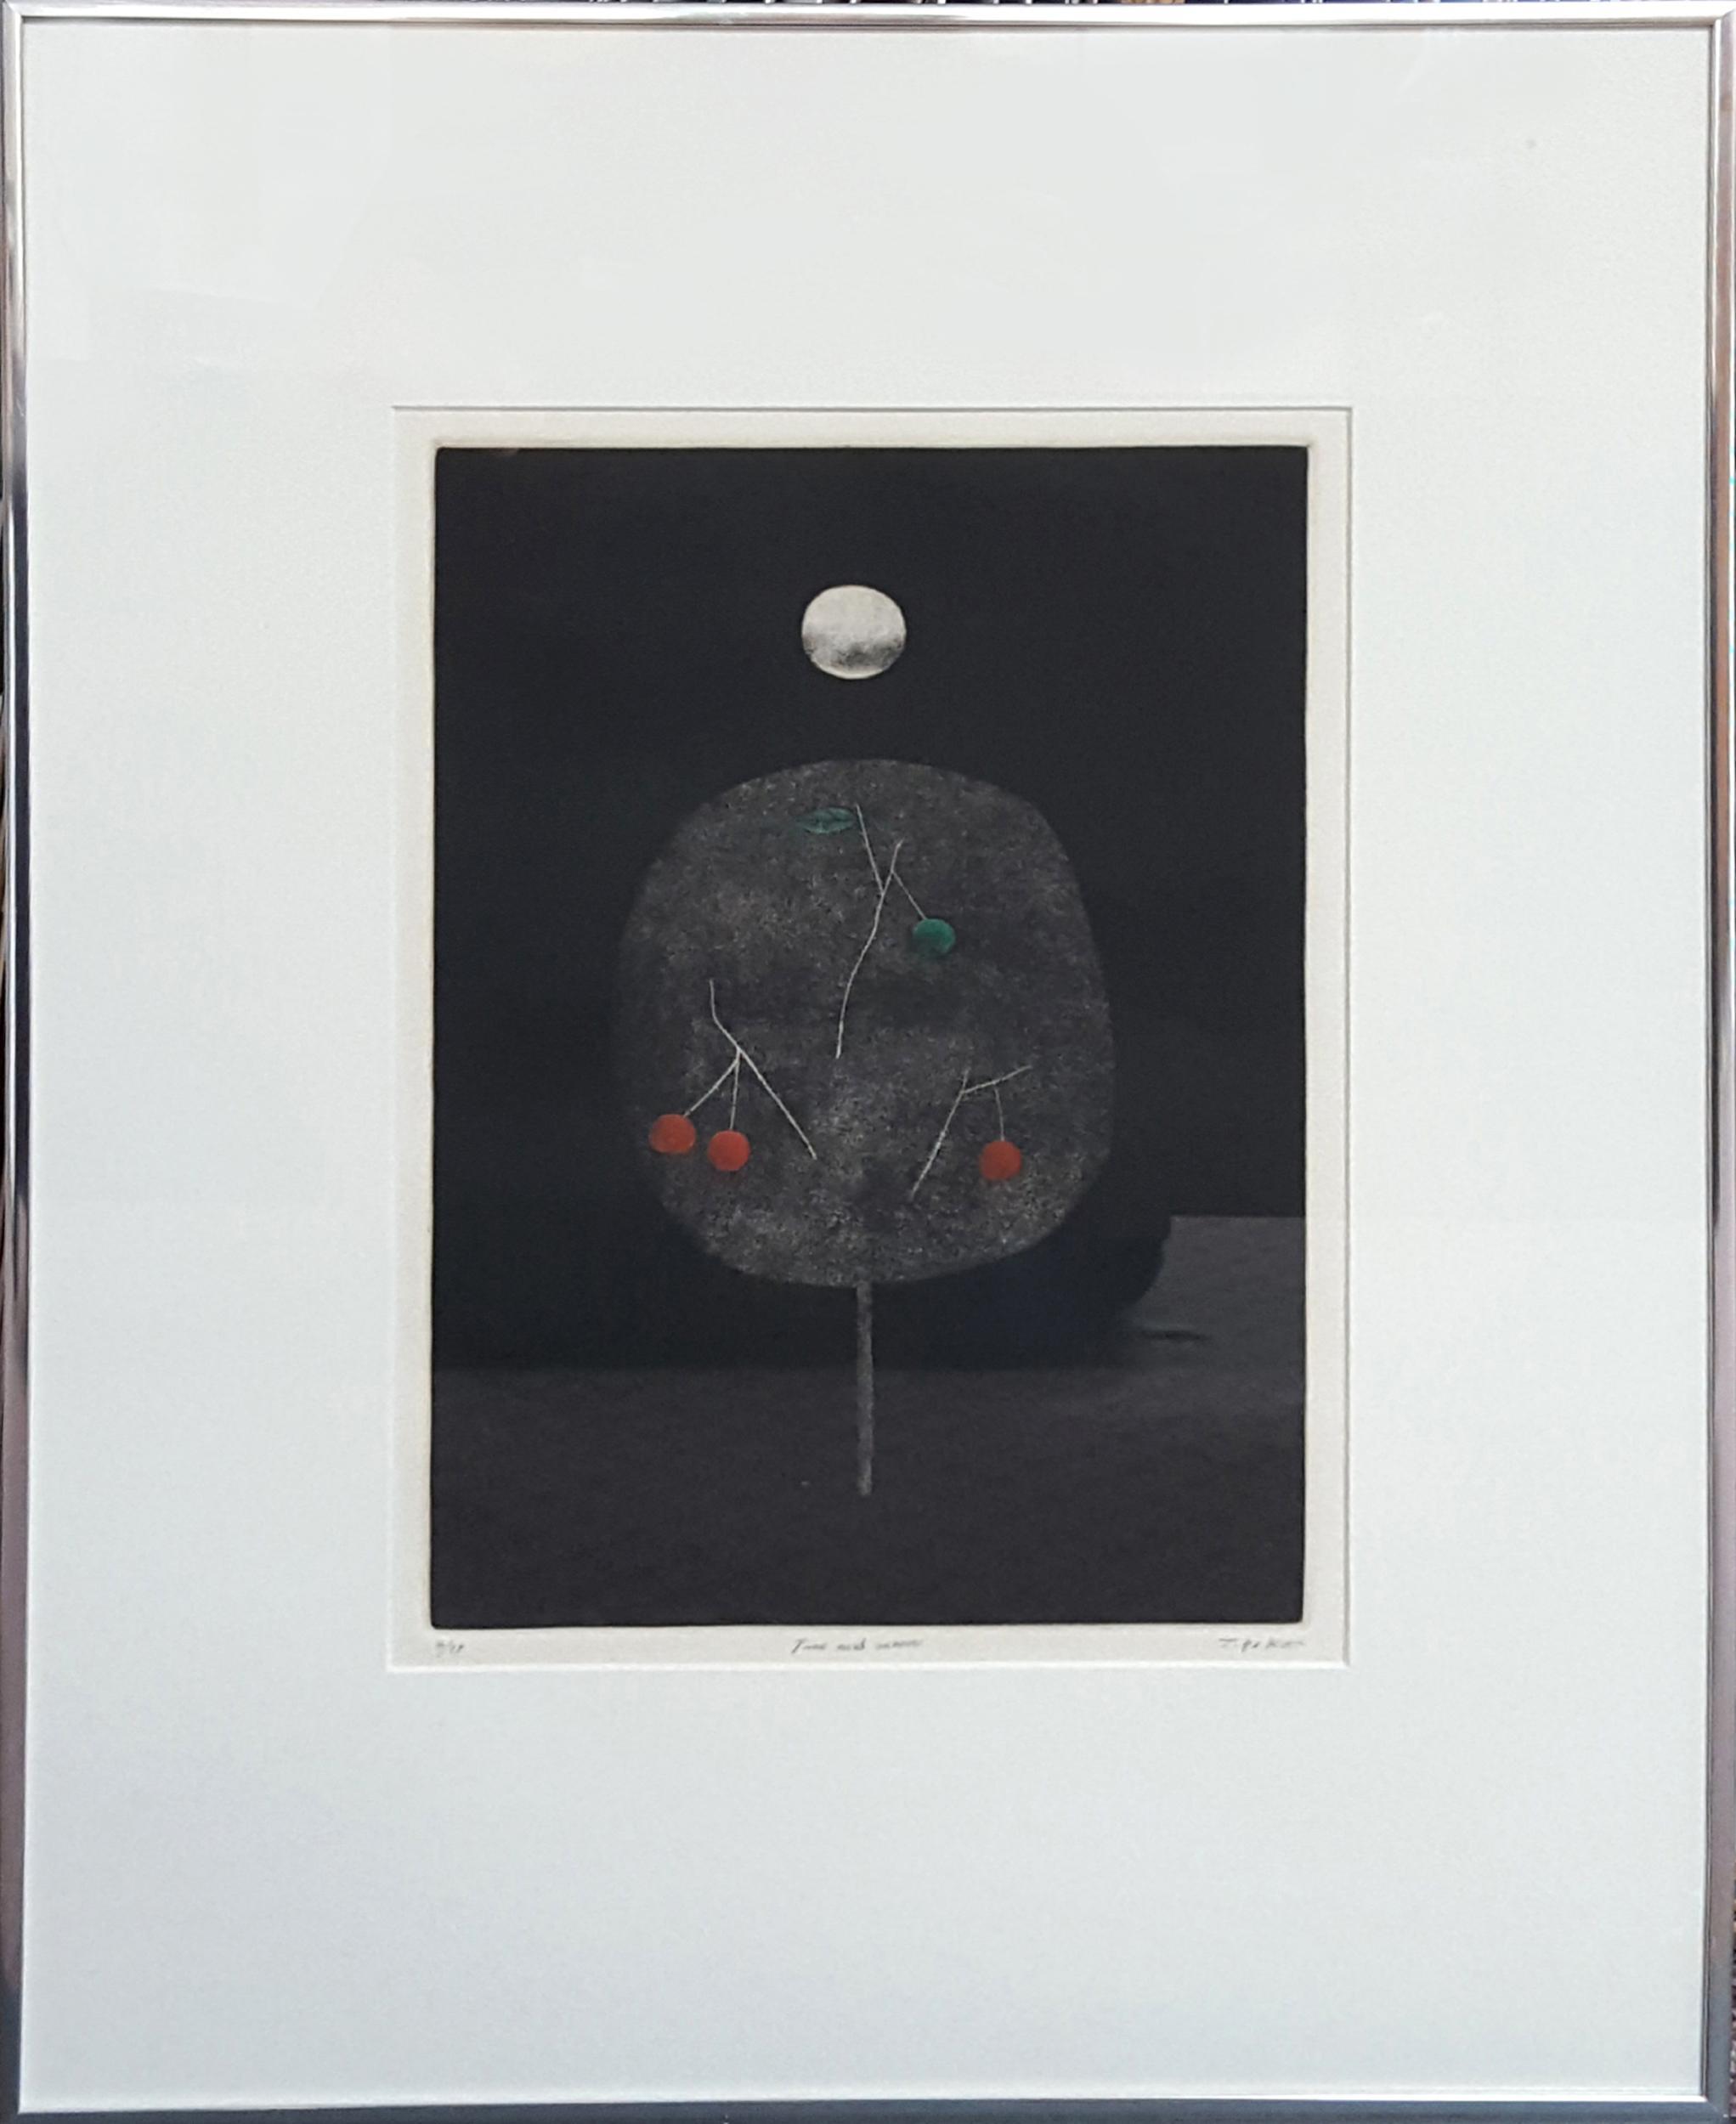 Tomoe Yokoi, Tree and Moon, Mezzotint